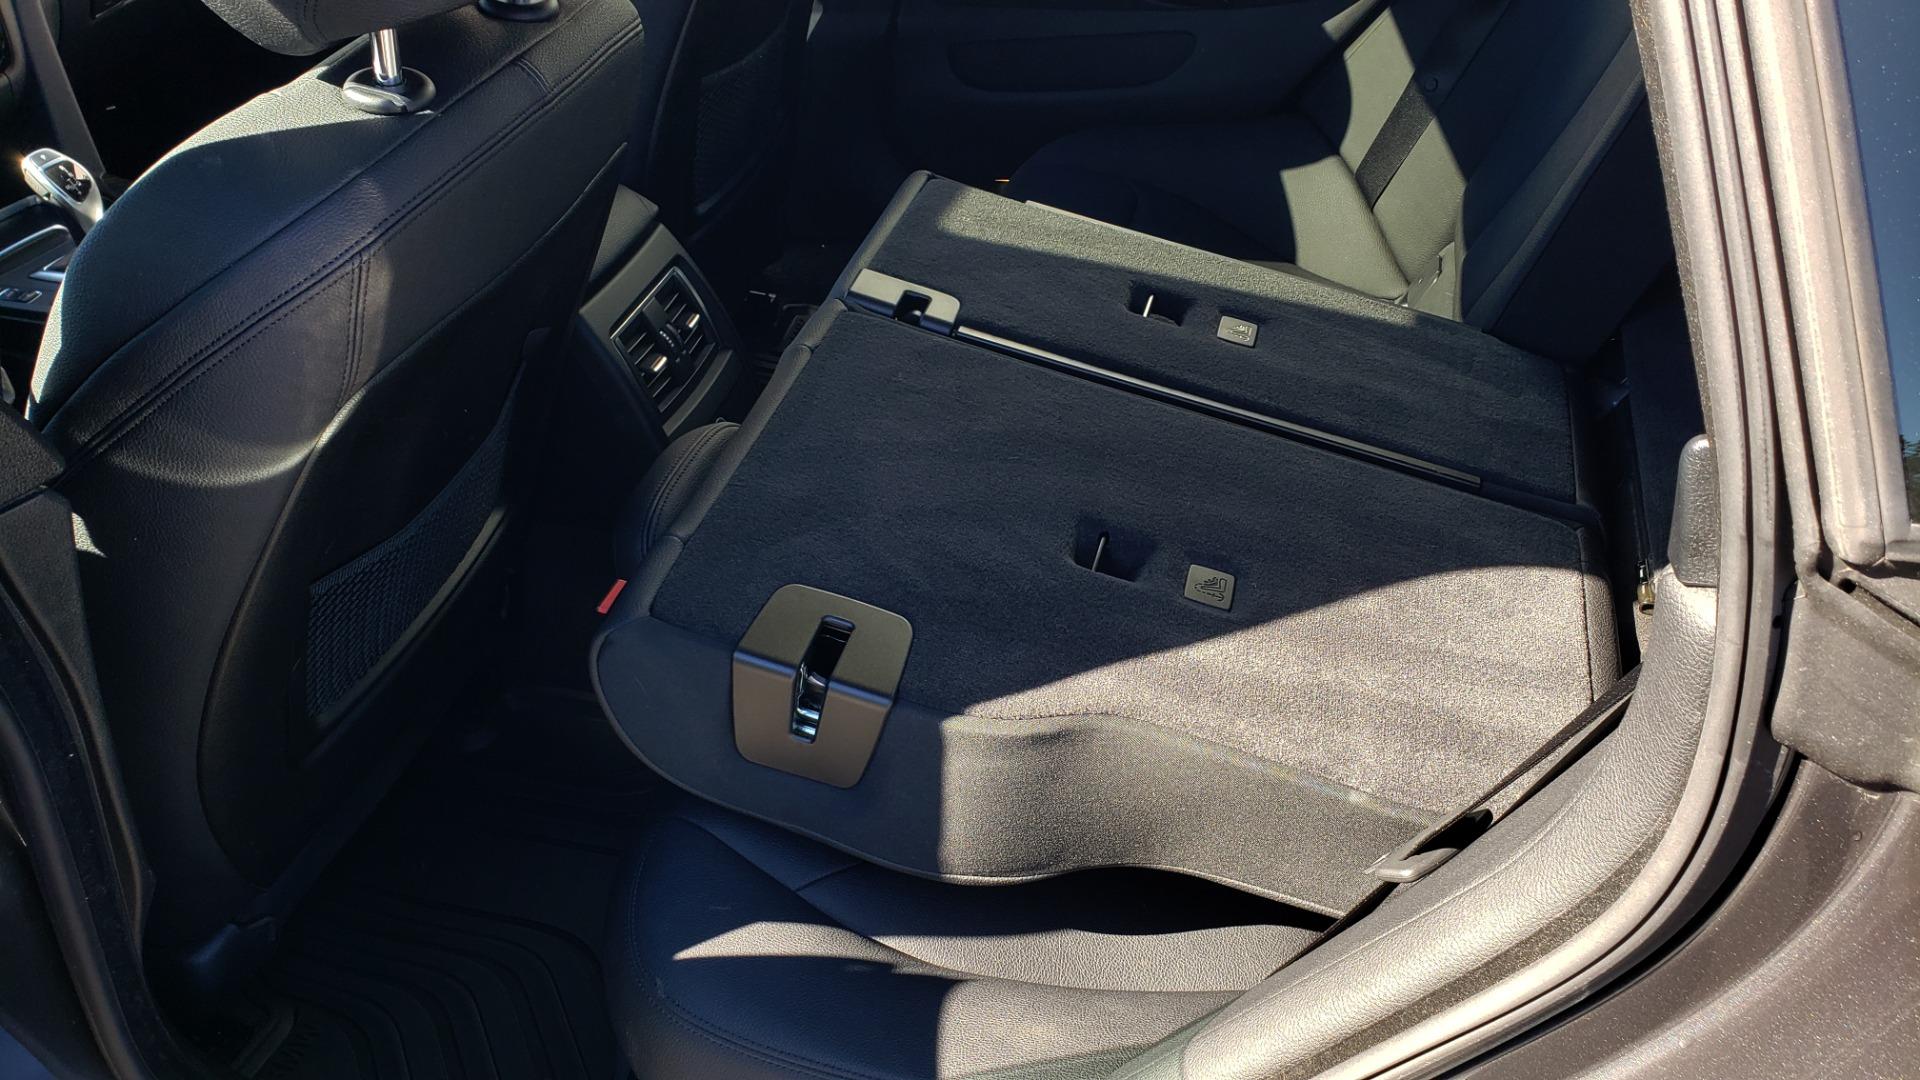 Used 2018 BMW 4 SERIES 430IXDRIVE / PREMIUM / NAV / SUNROOF / ESSENTIALS PKG for sale $29,495 at Formula Imports in Charlotte NC 28227 60